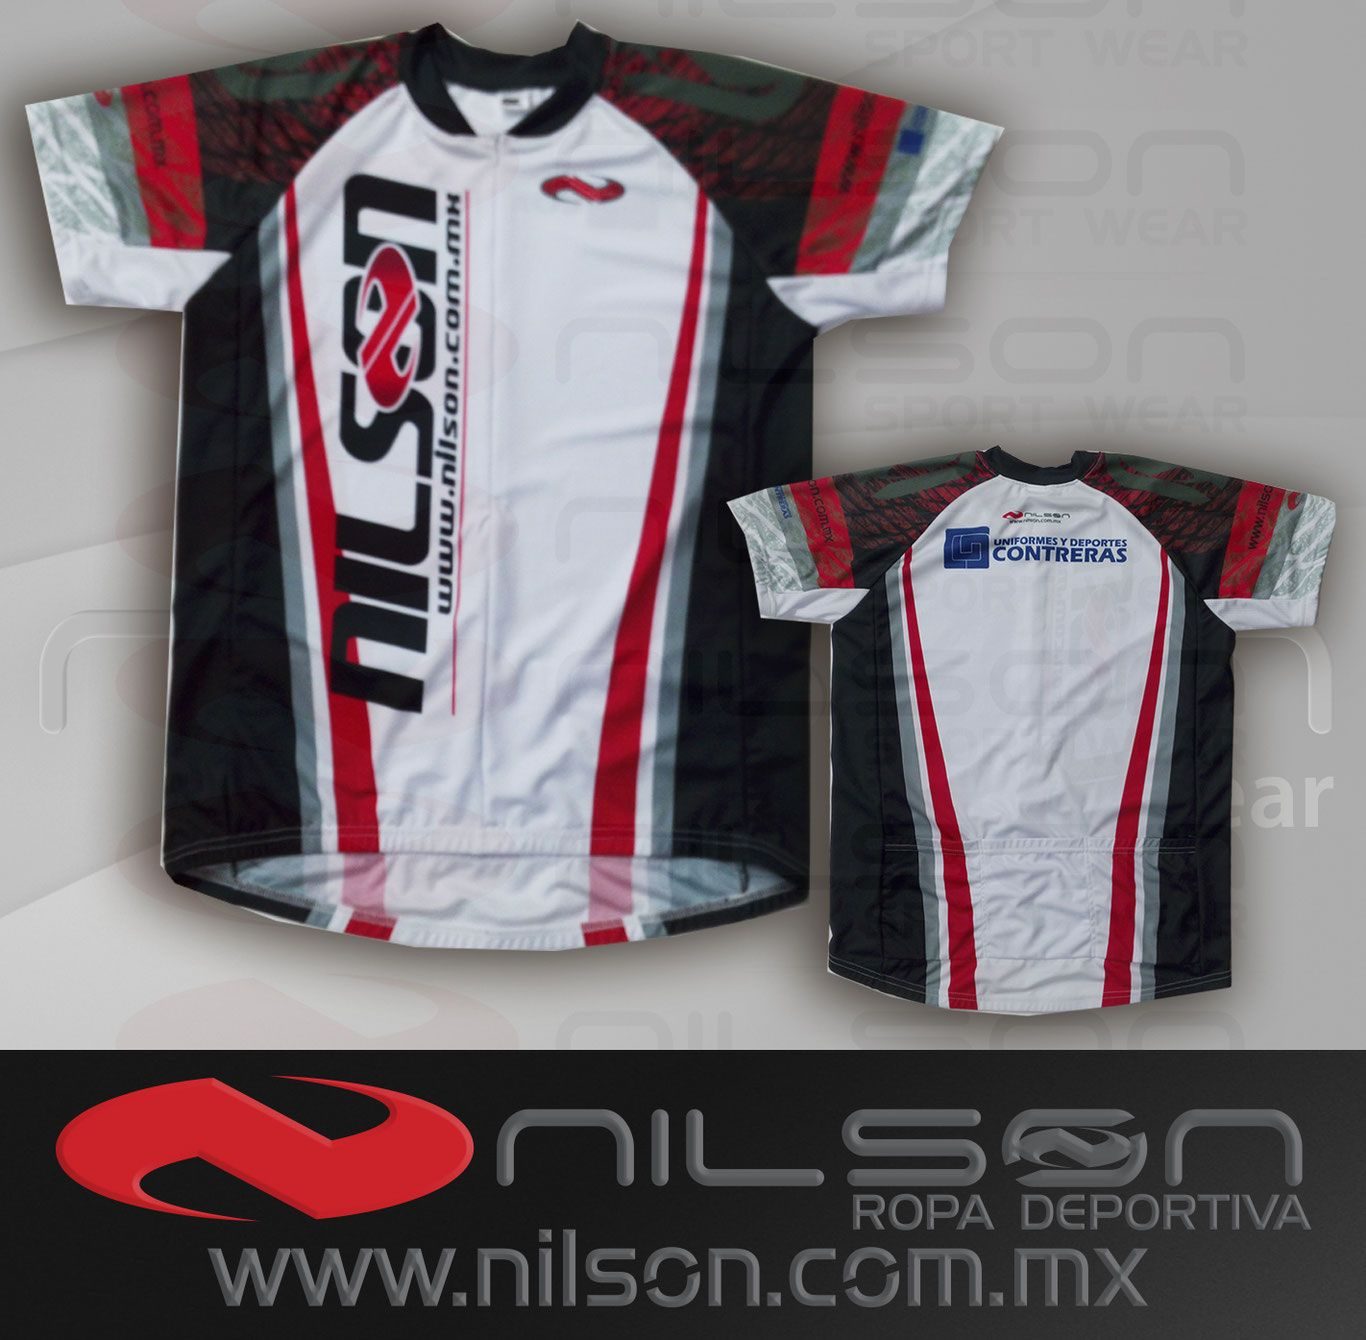 JERSEY NILSON CICLISMO Ropa Deportiva 1b509907997